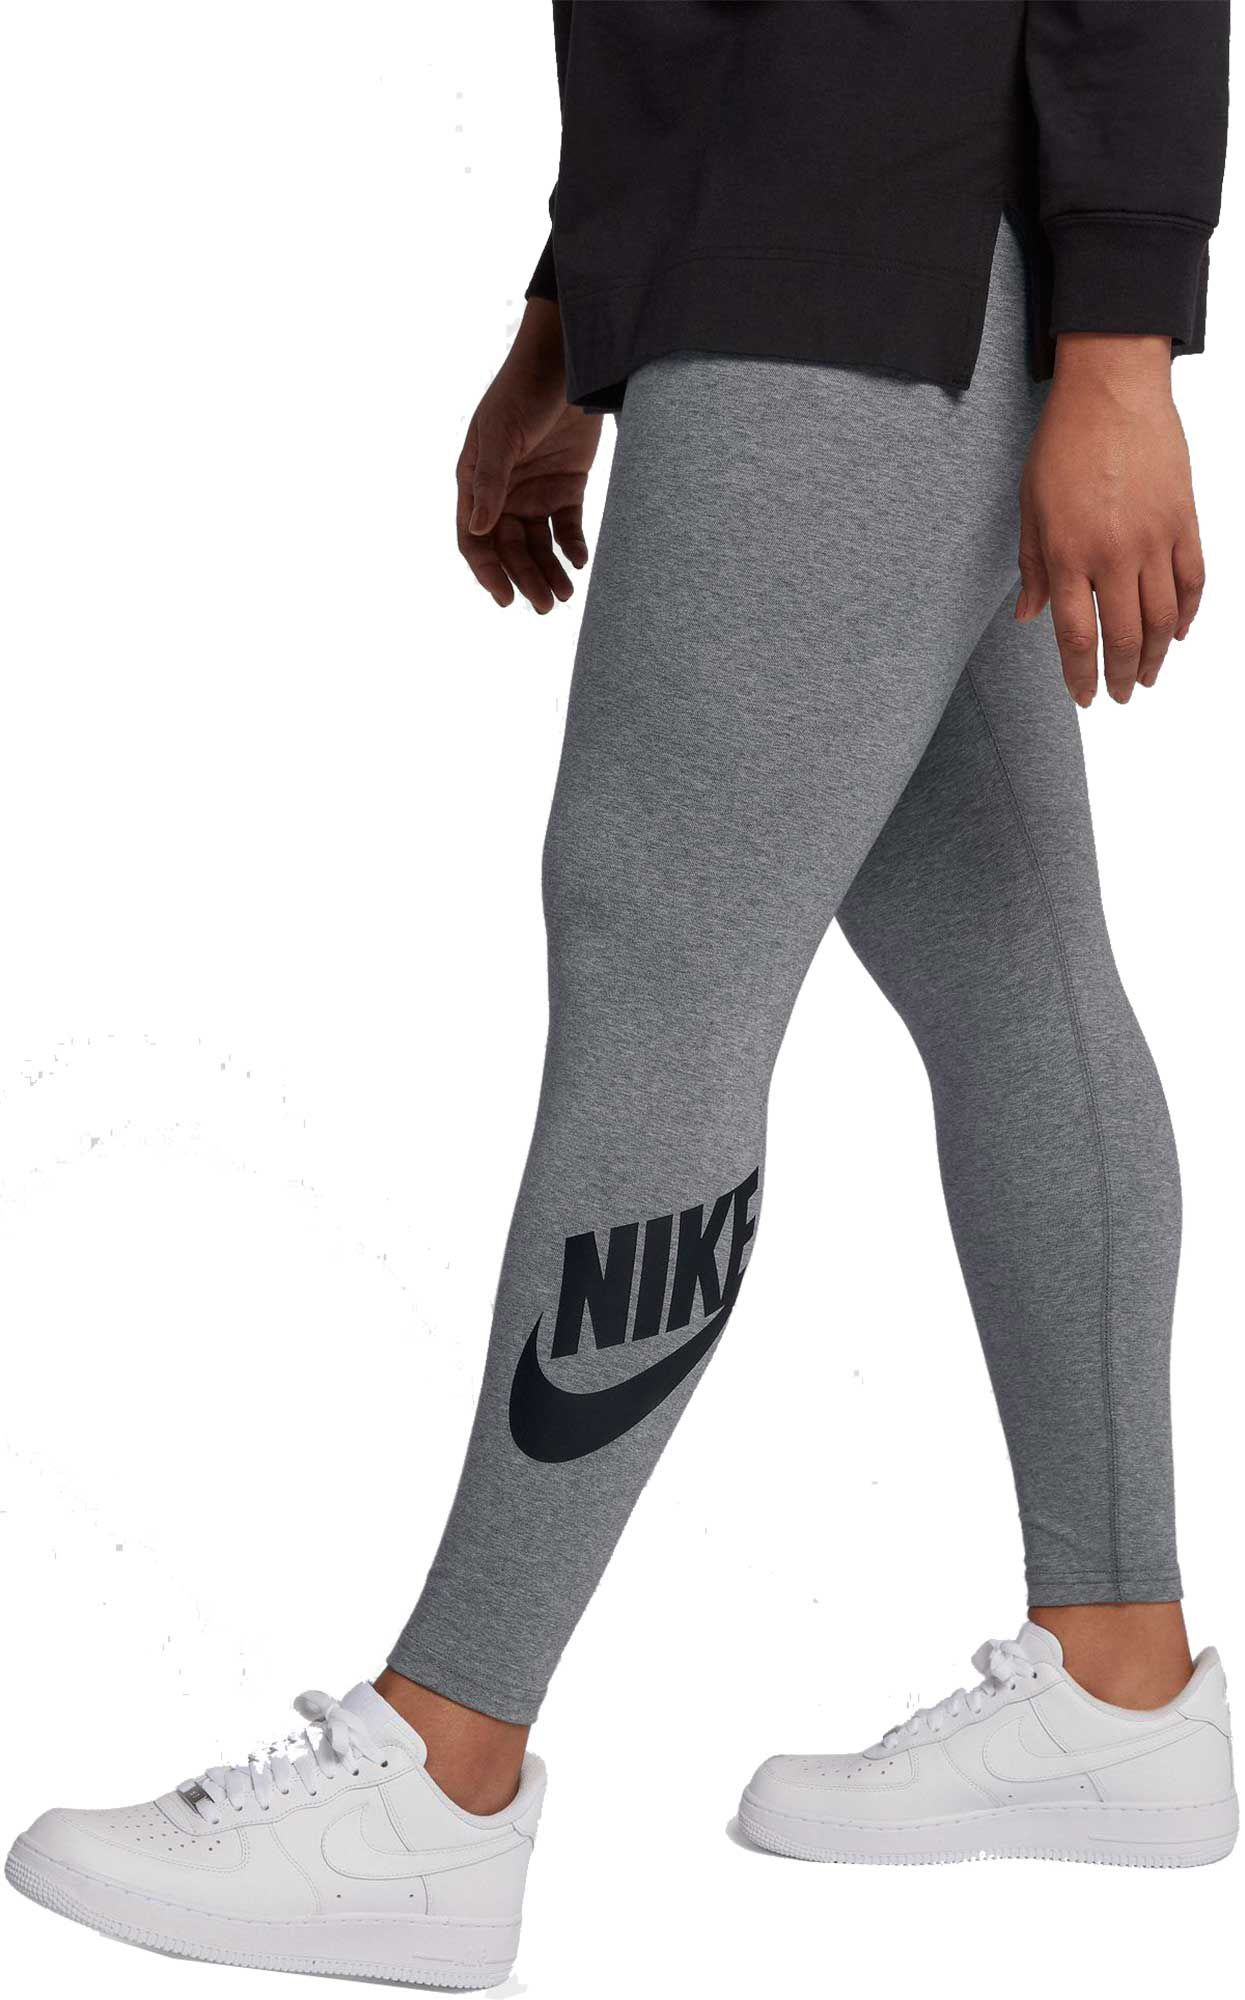 dd12e14b252f4c Nike Women's Plus Size Sportswear High Waisted Leg-A-See Leggings ...